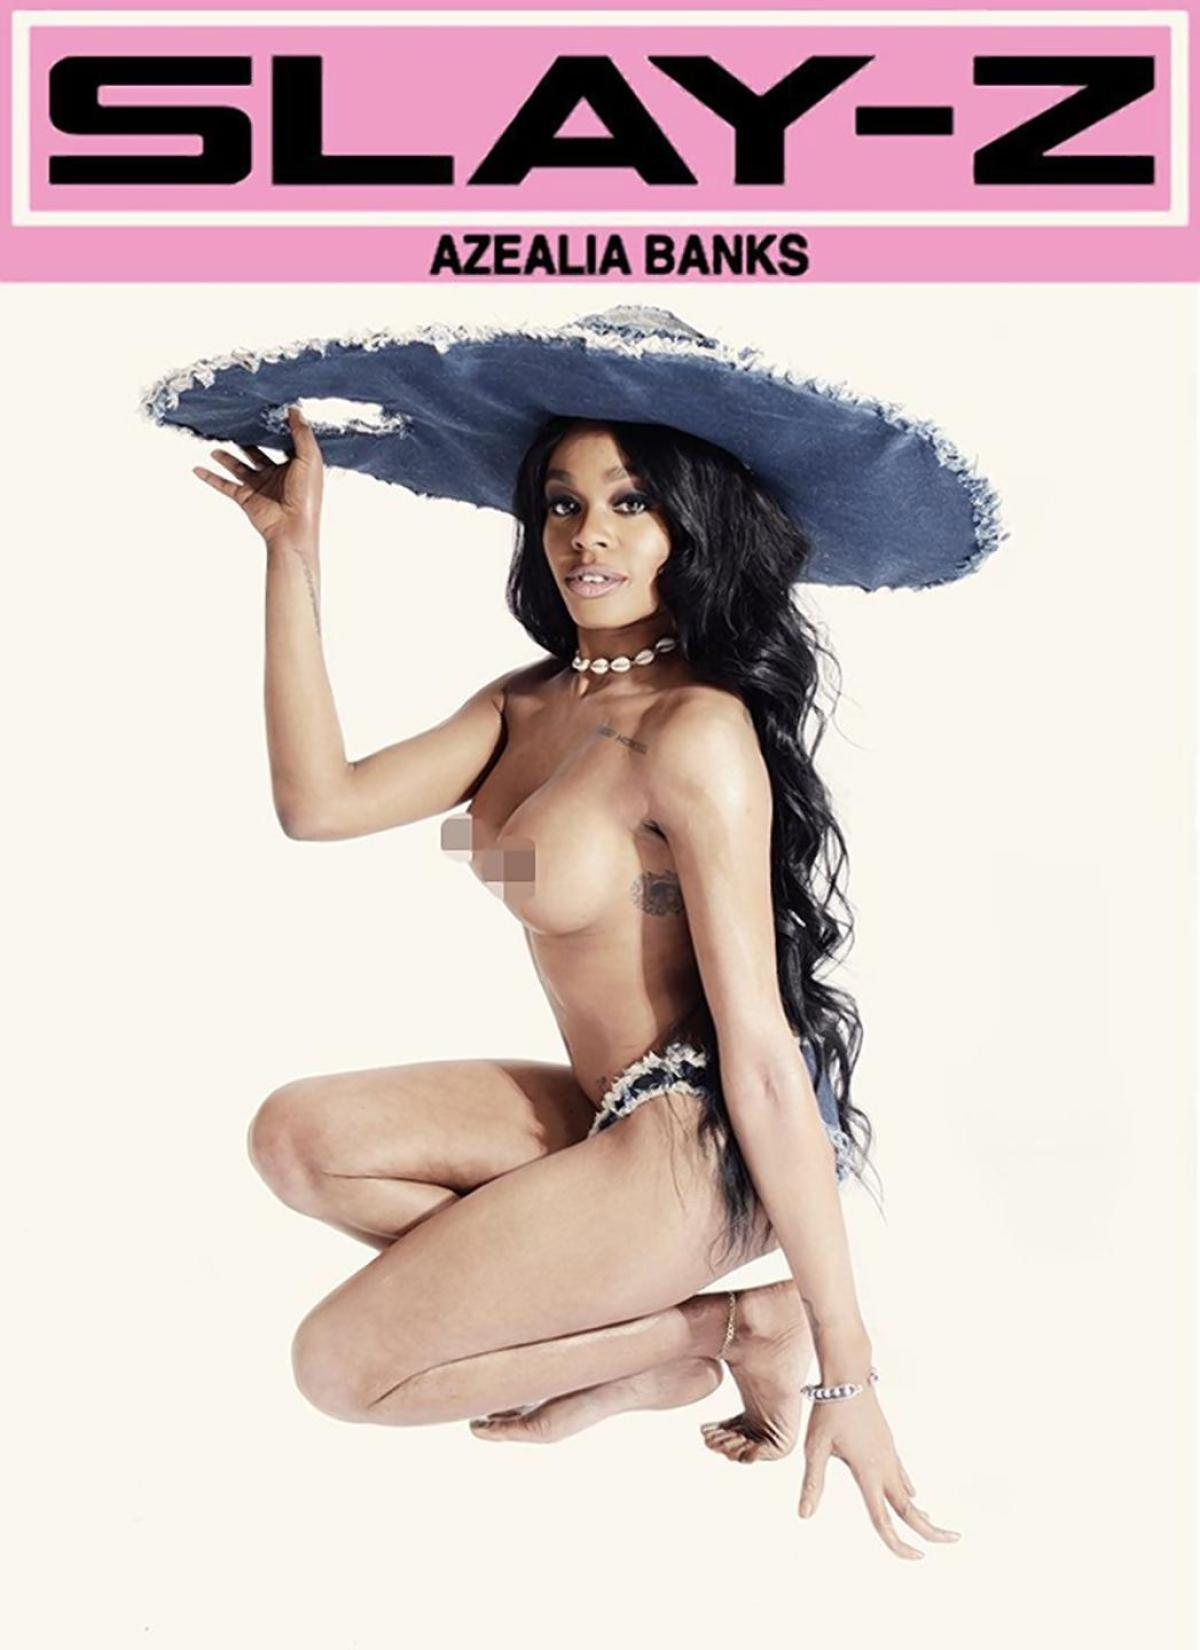 Azealia banks tits - 2019 year